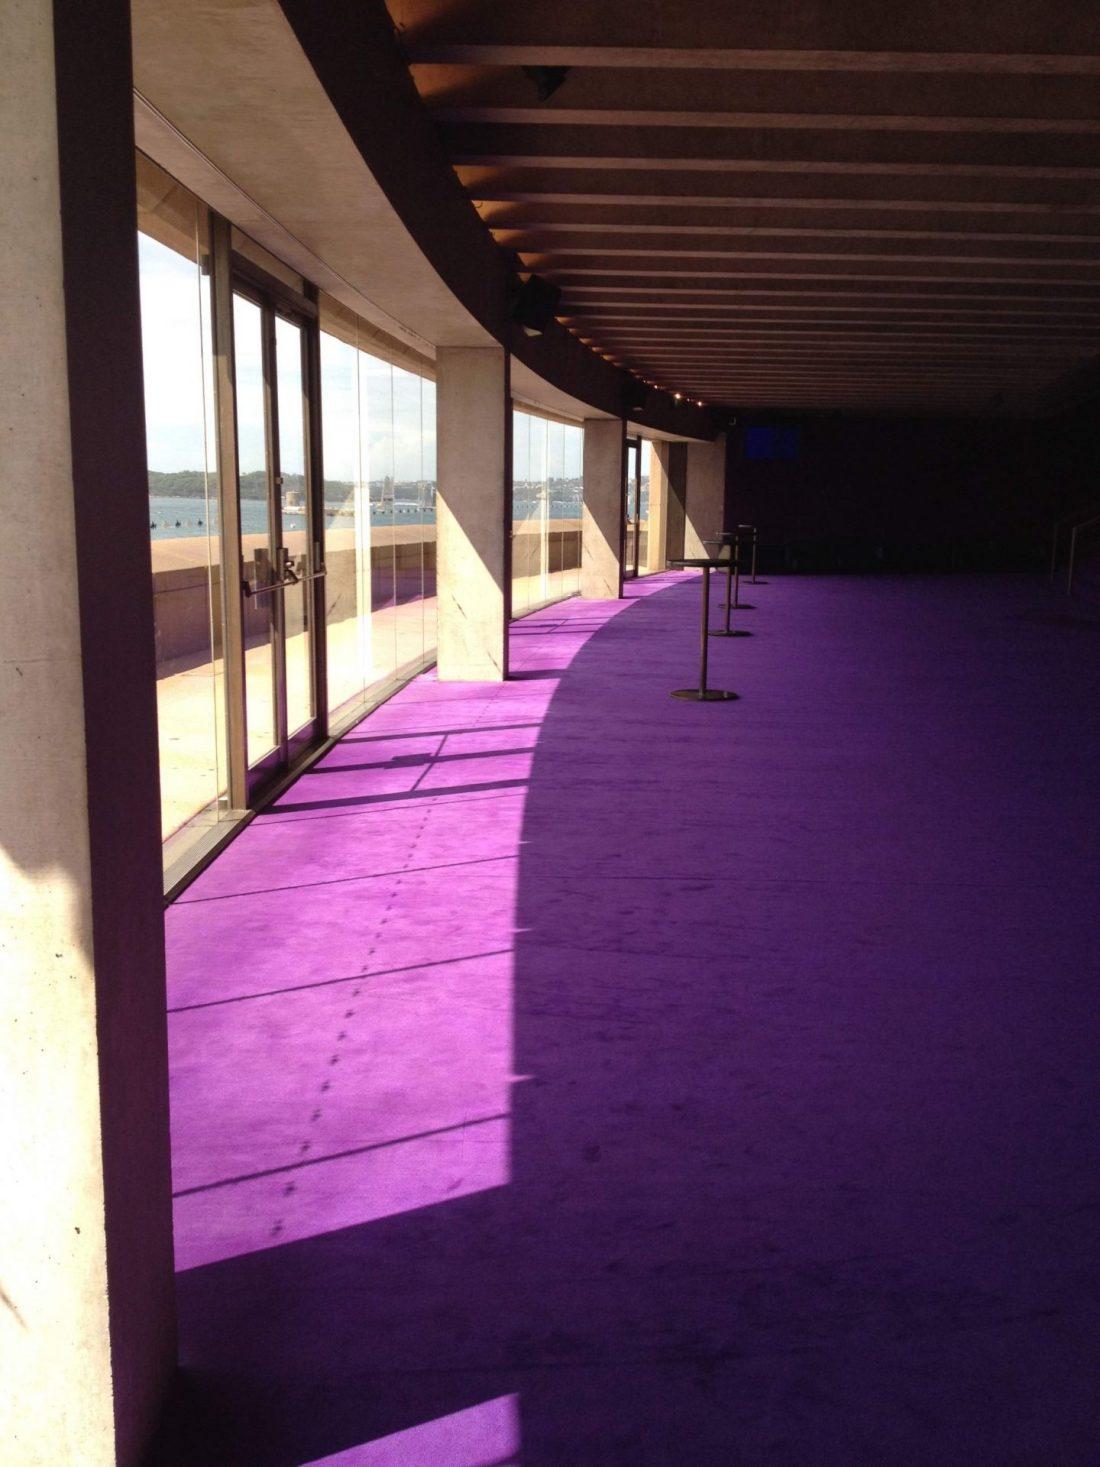 Purple carpet of inside Sydney Opera House